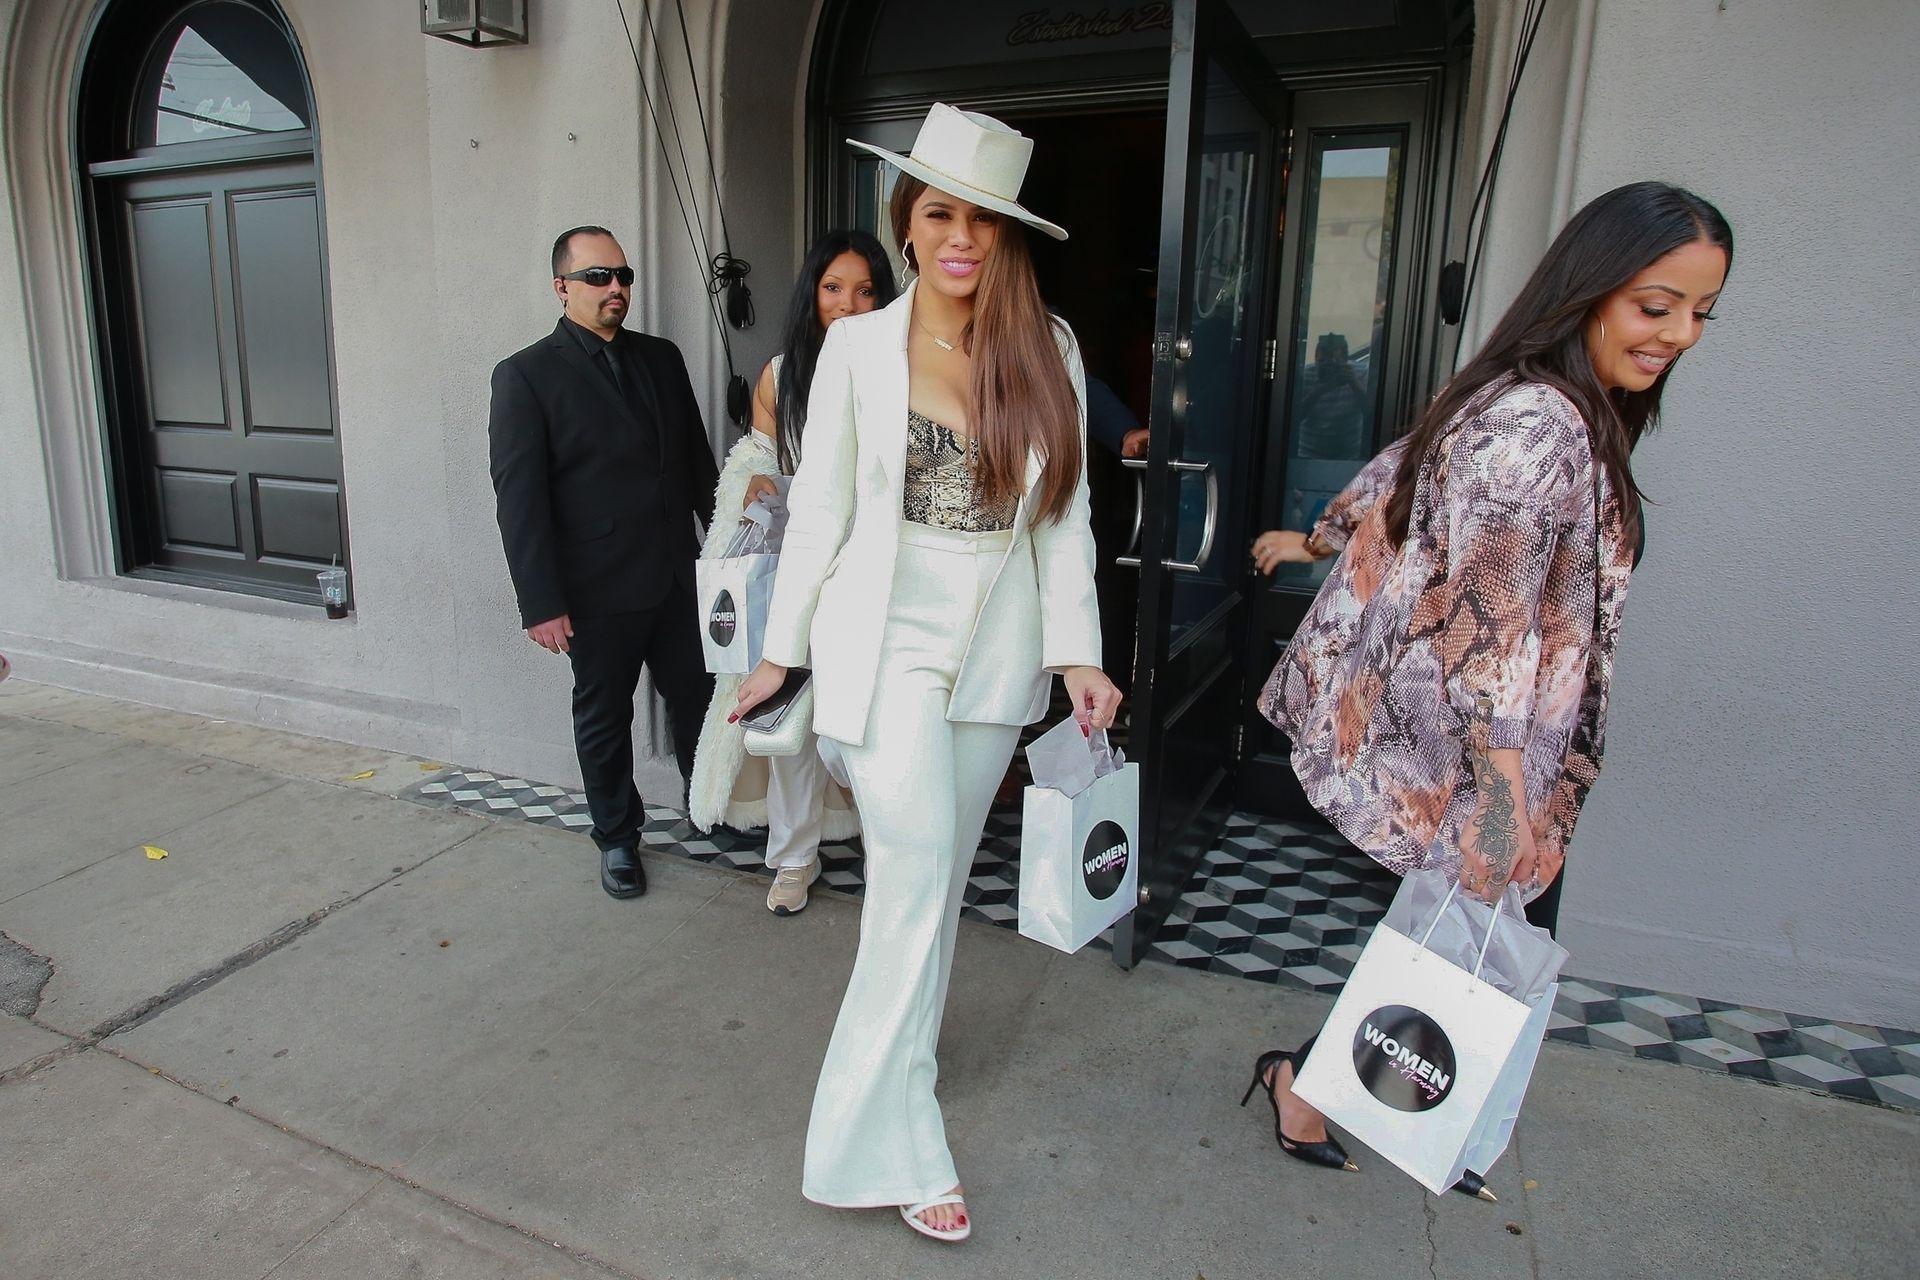 Dinah Jane Departs The Women In Harmony Pre Grammy Luncheon 0009